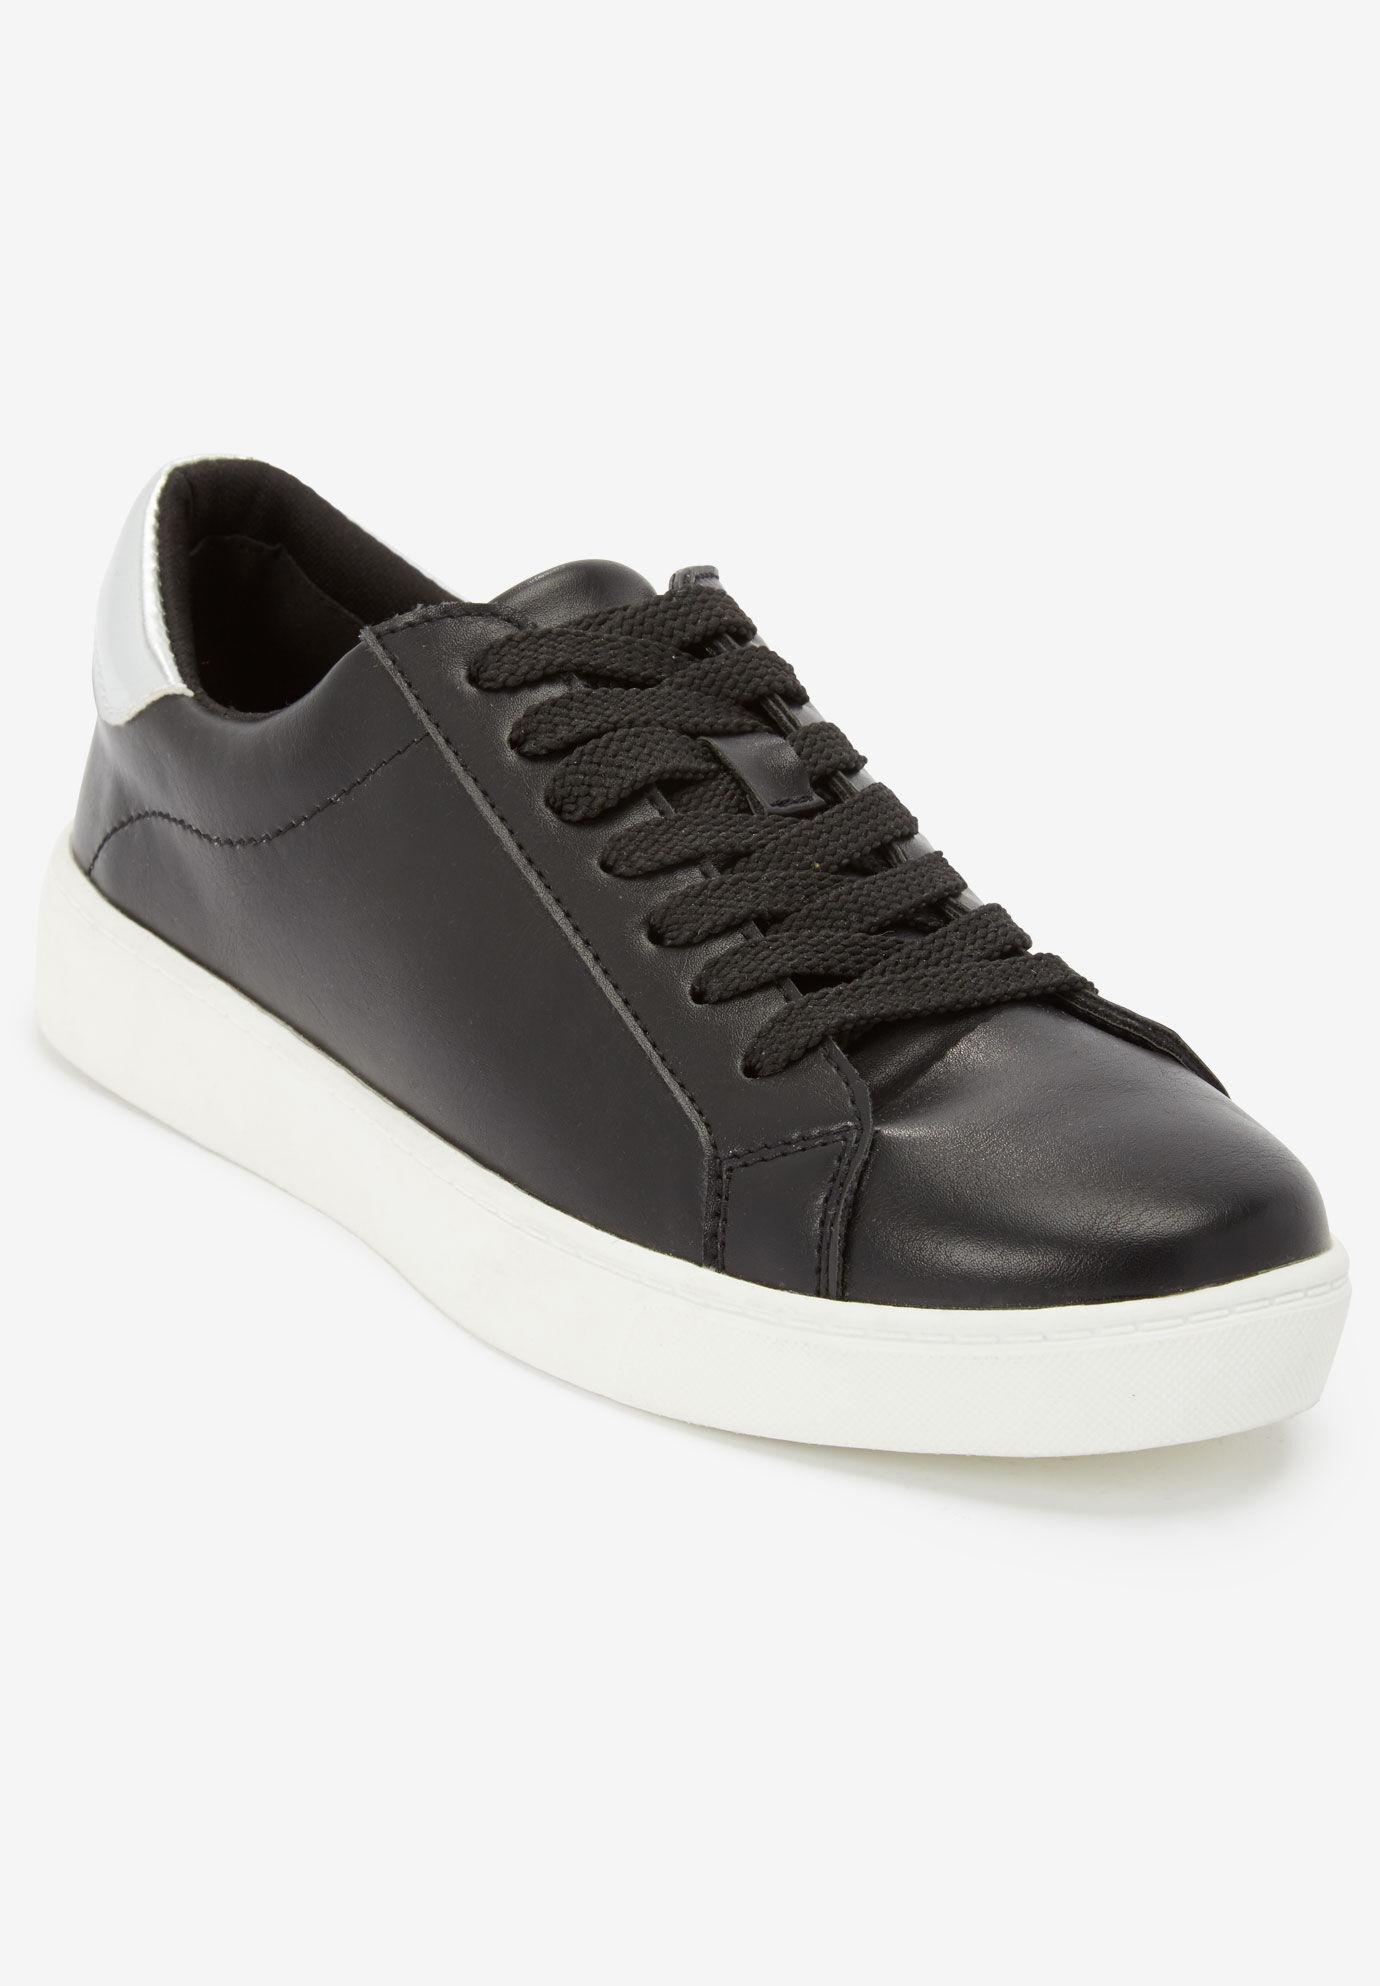 Clearance Plus Size Shoes \u0026 Boots